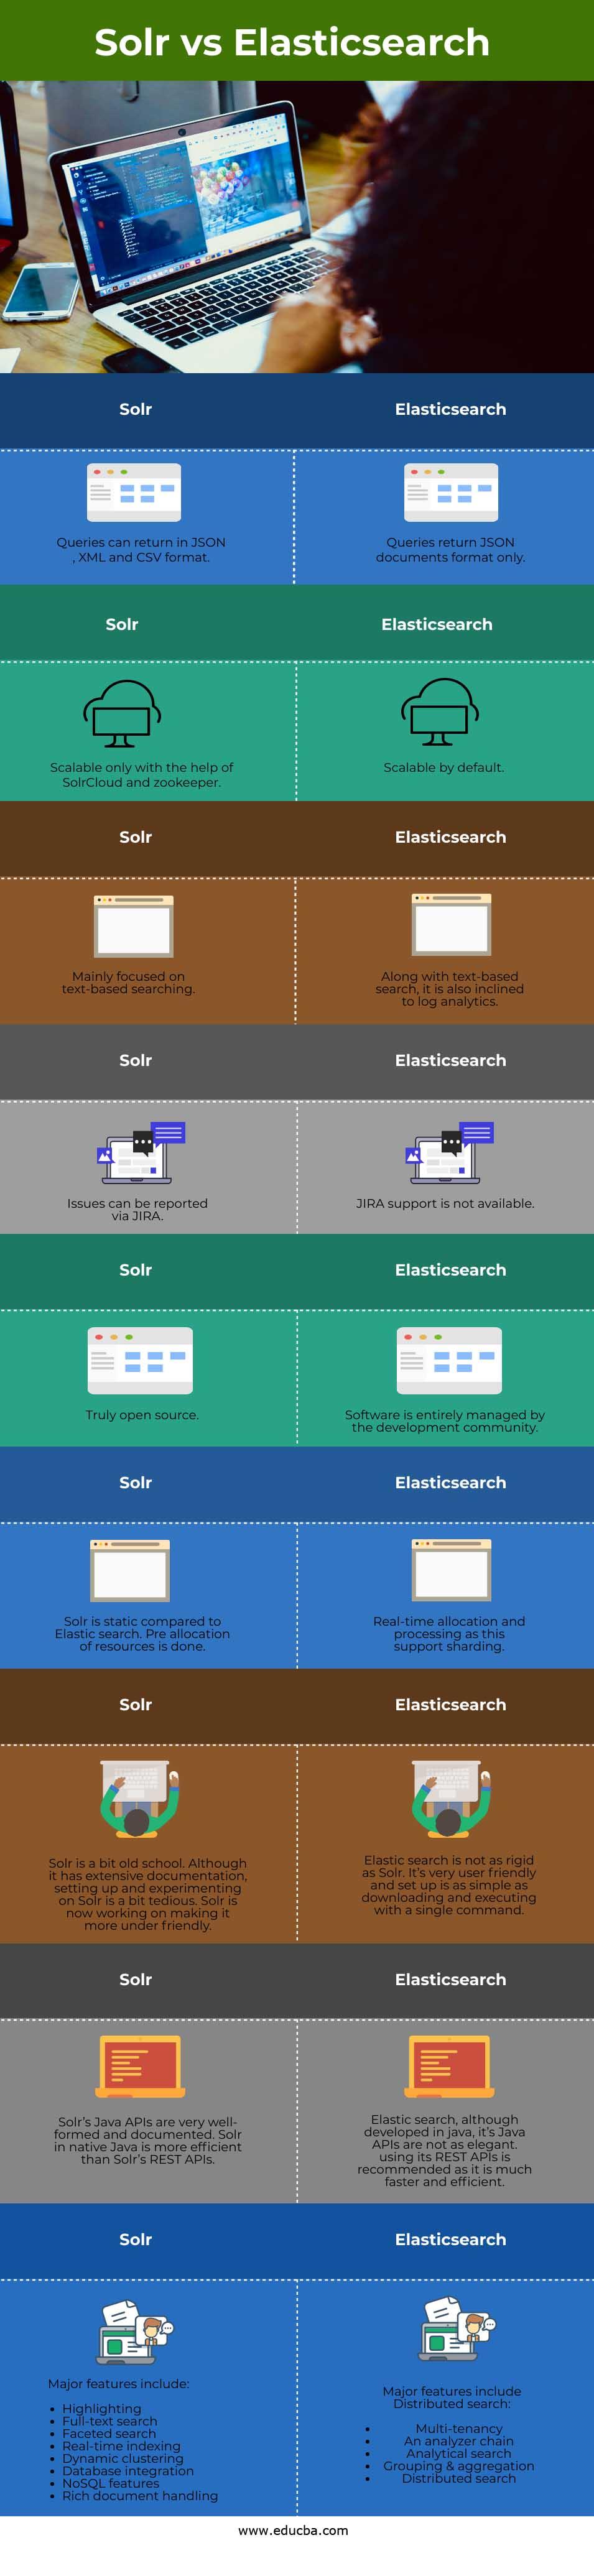 SolrvsElasticsearch info